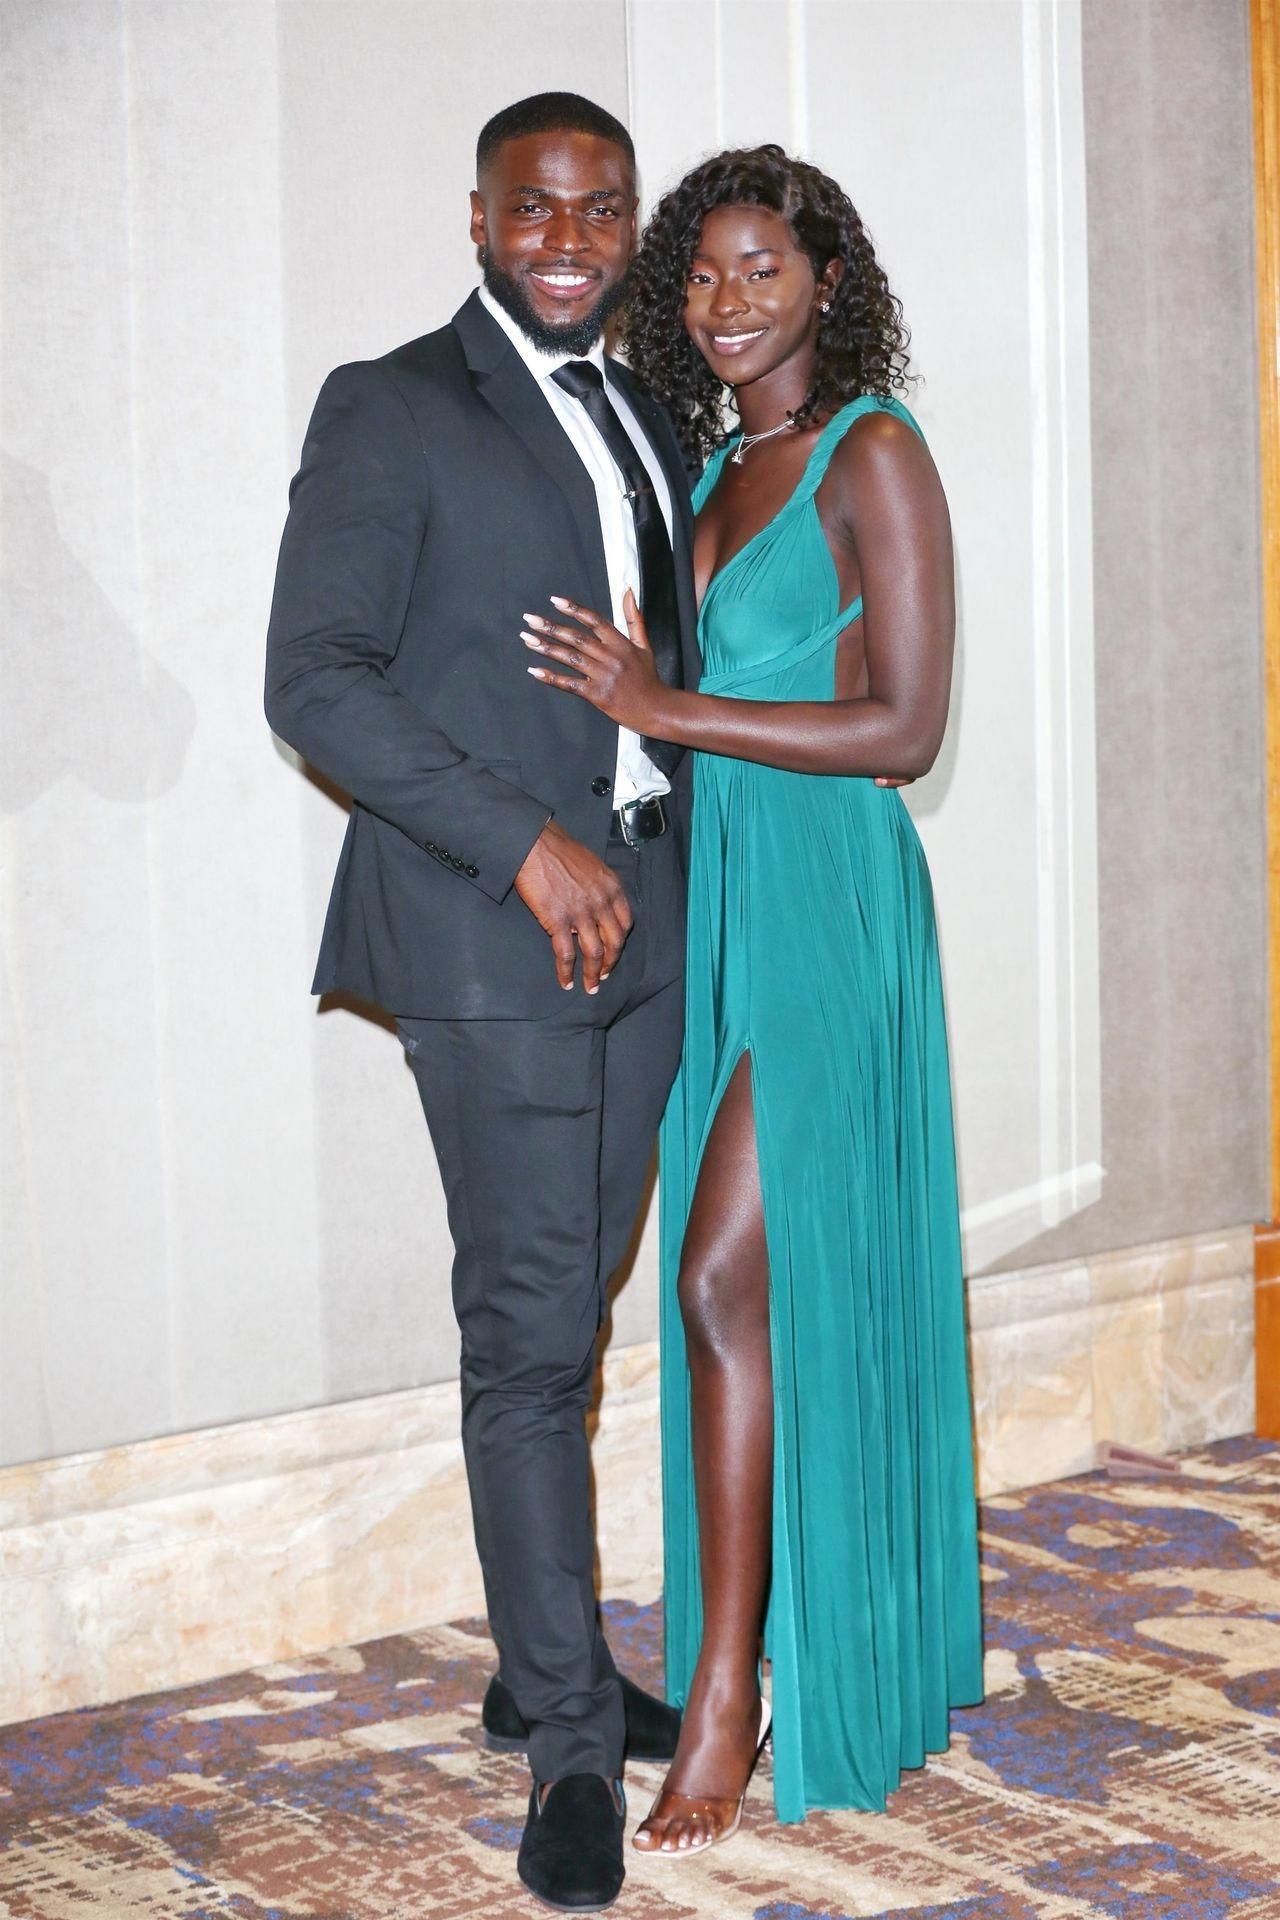 Mike Boateng & Priscilla Anyabu Are Seen At British Ethnic Diversity Sports Awards 0121